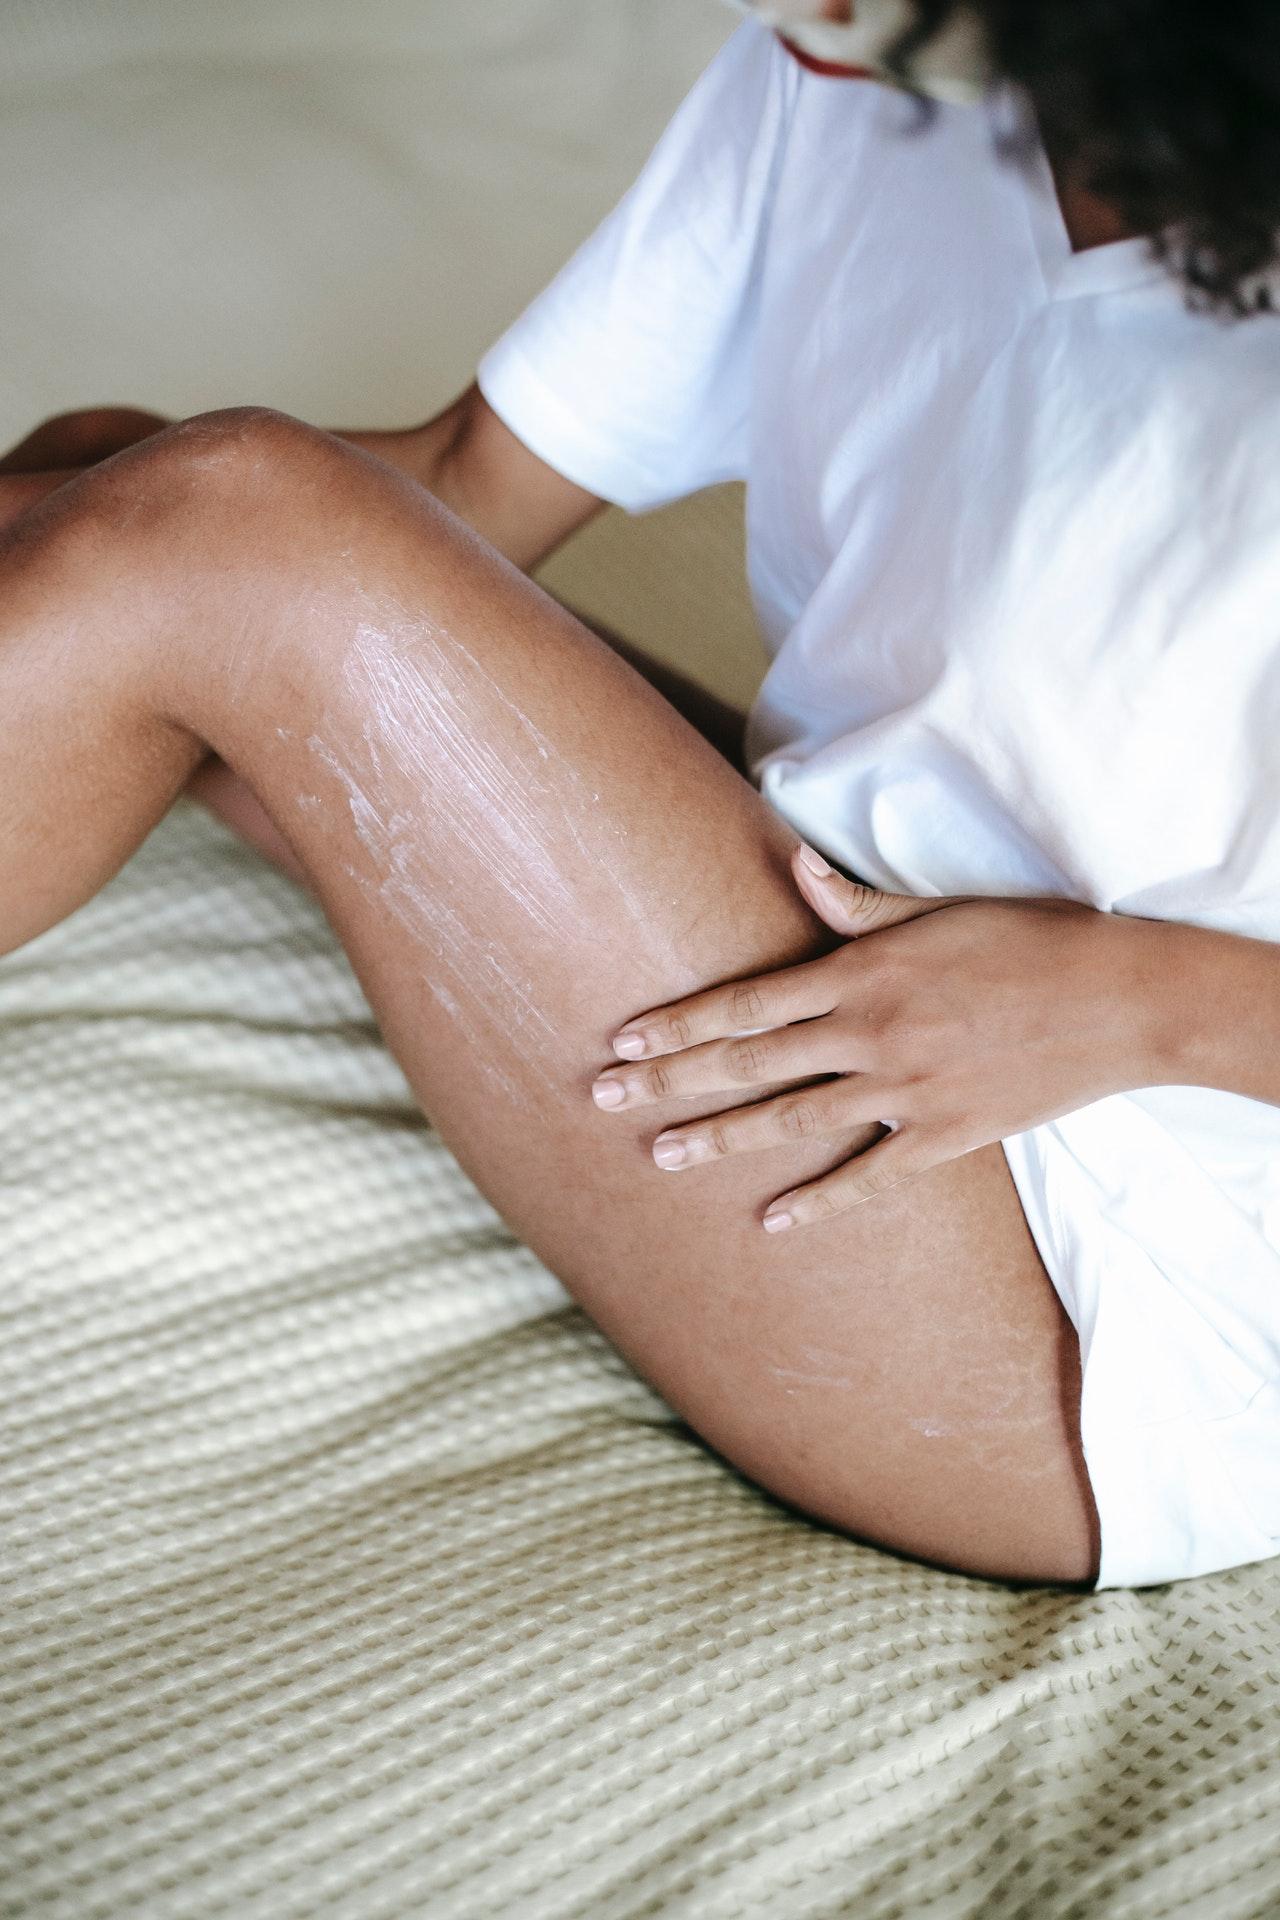 Why Non-Invasive Treatment Methods Work for Swollen Legs